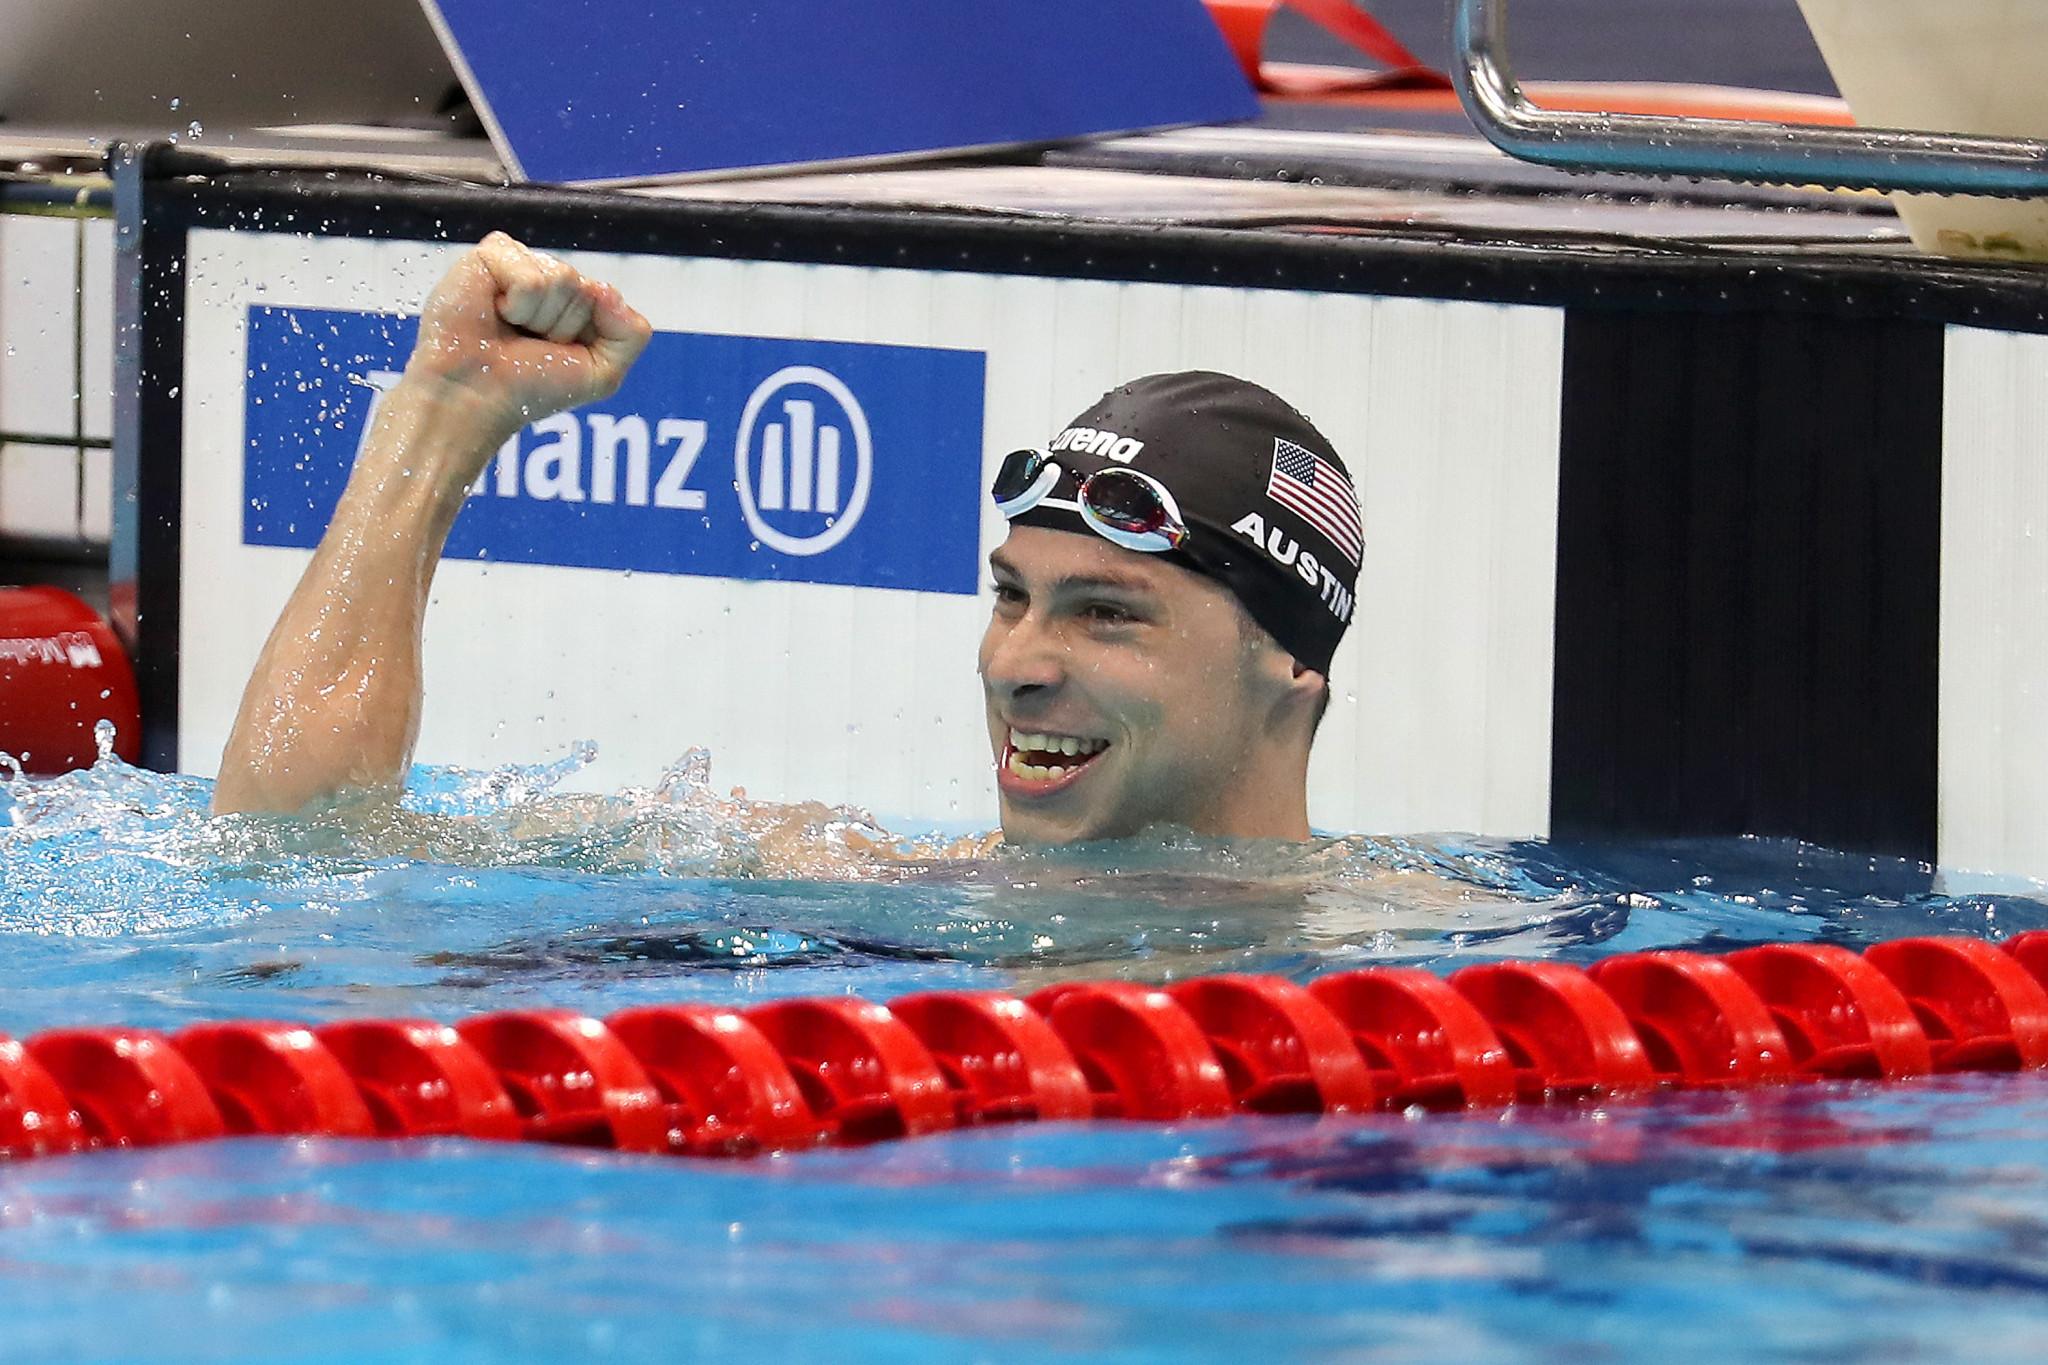 Austin wins double gold at Lewisville World Para Swimming World Series leg